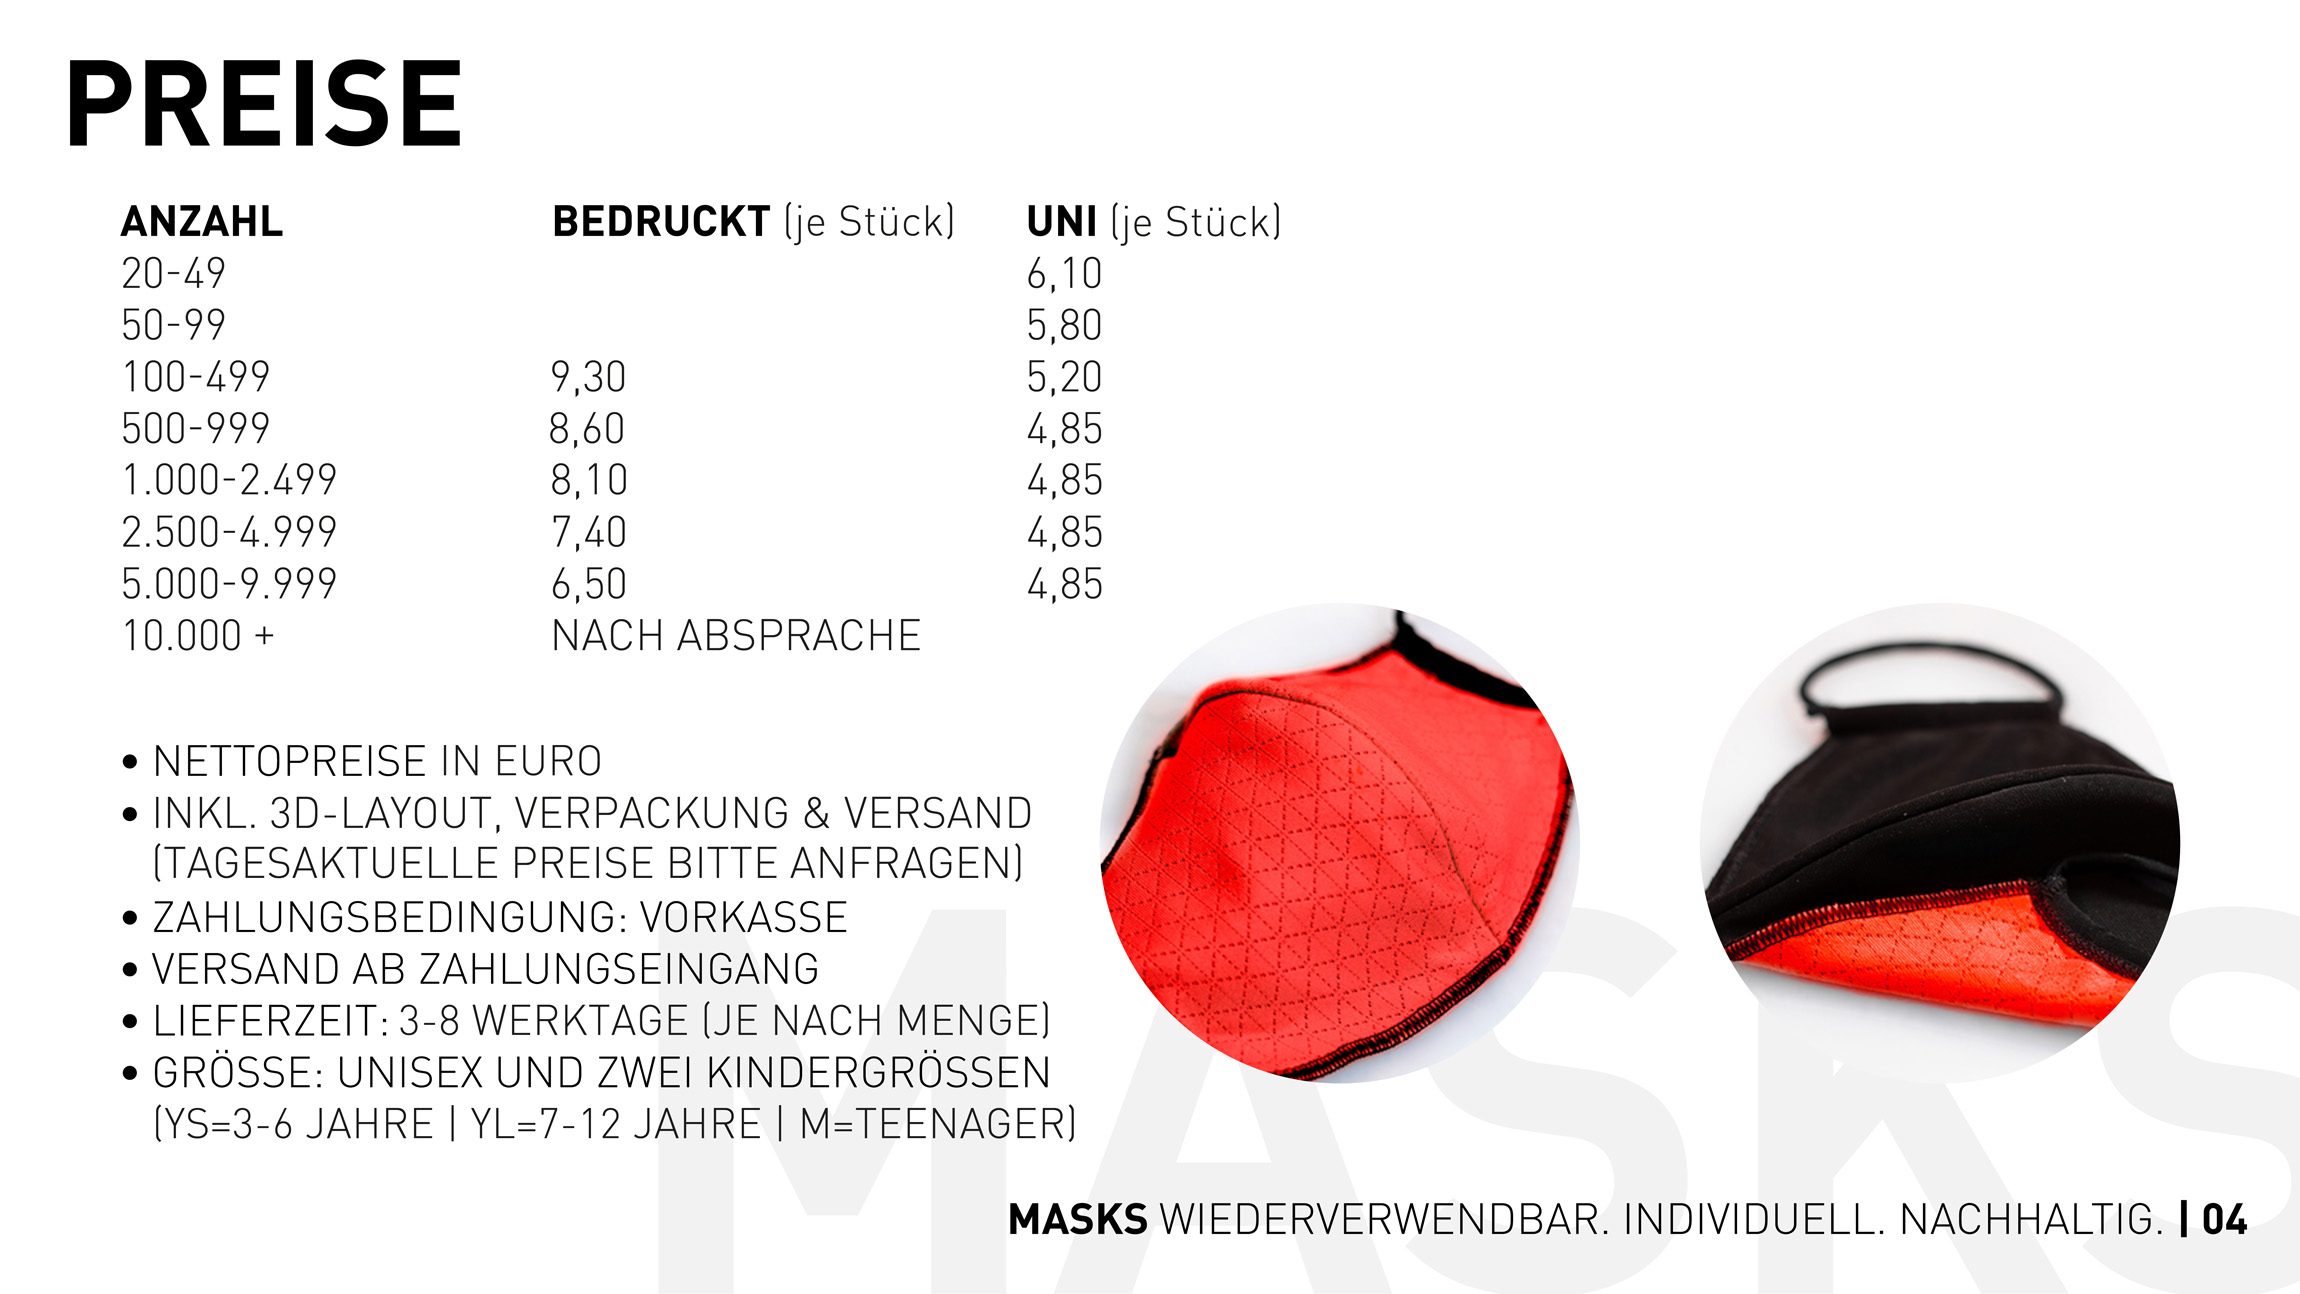 personalisierte-stoffmasken-preise-seite5-081220